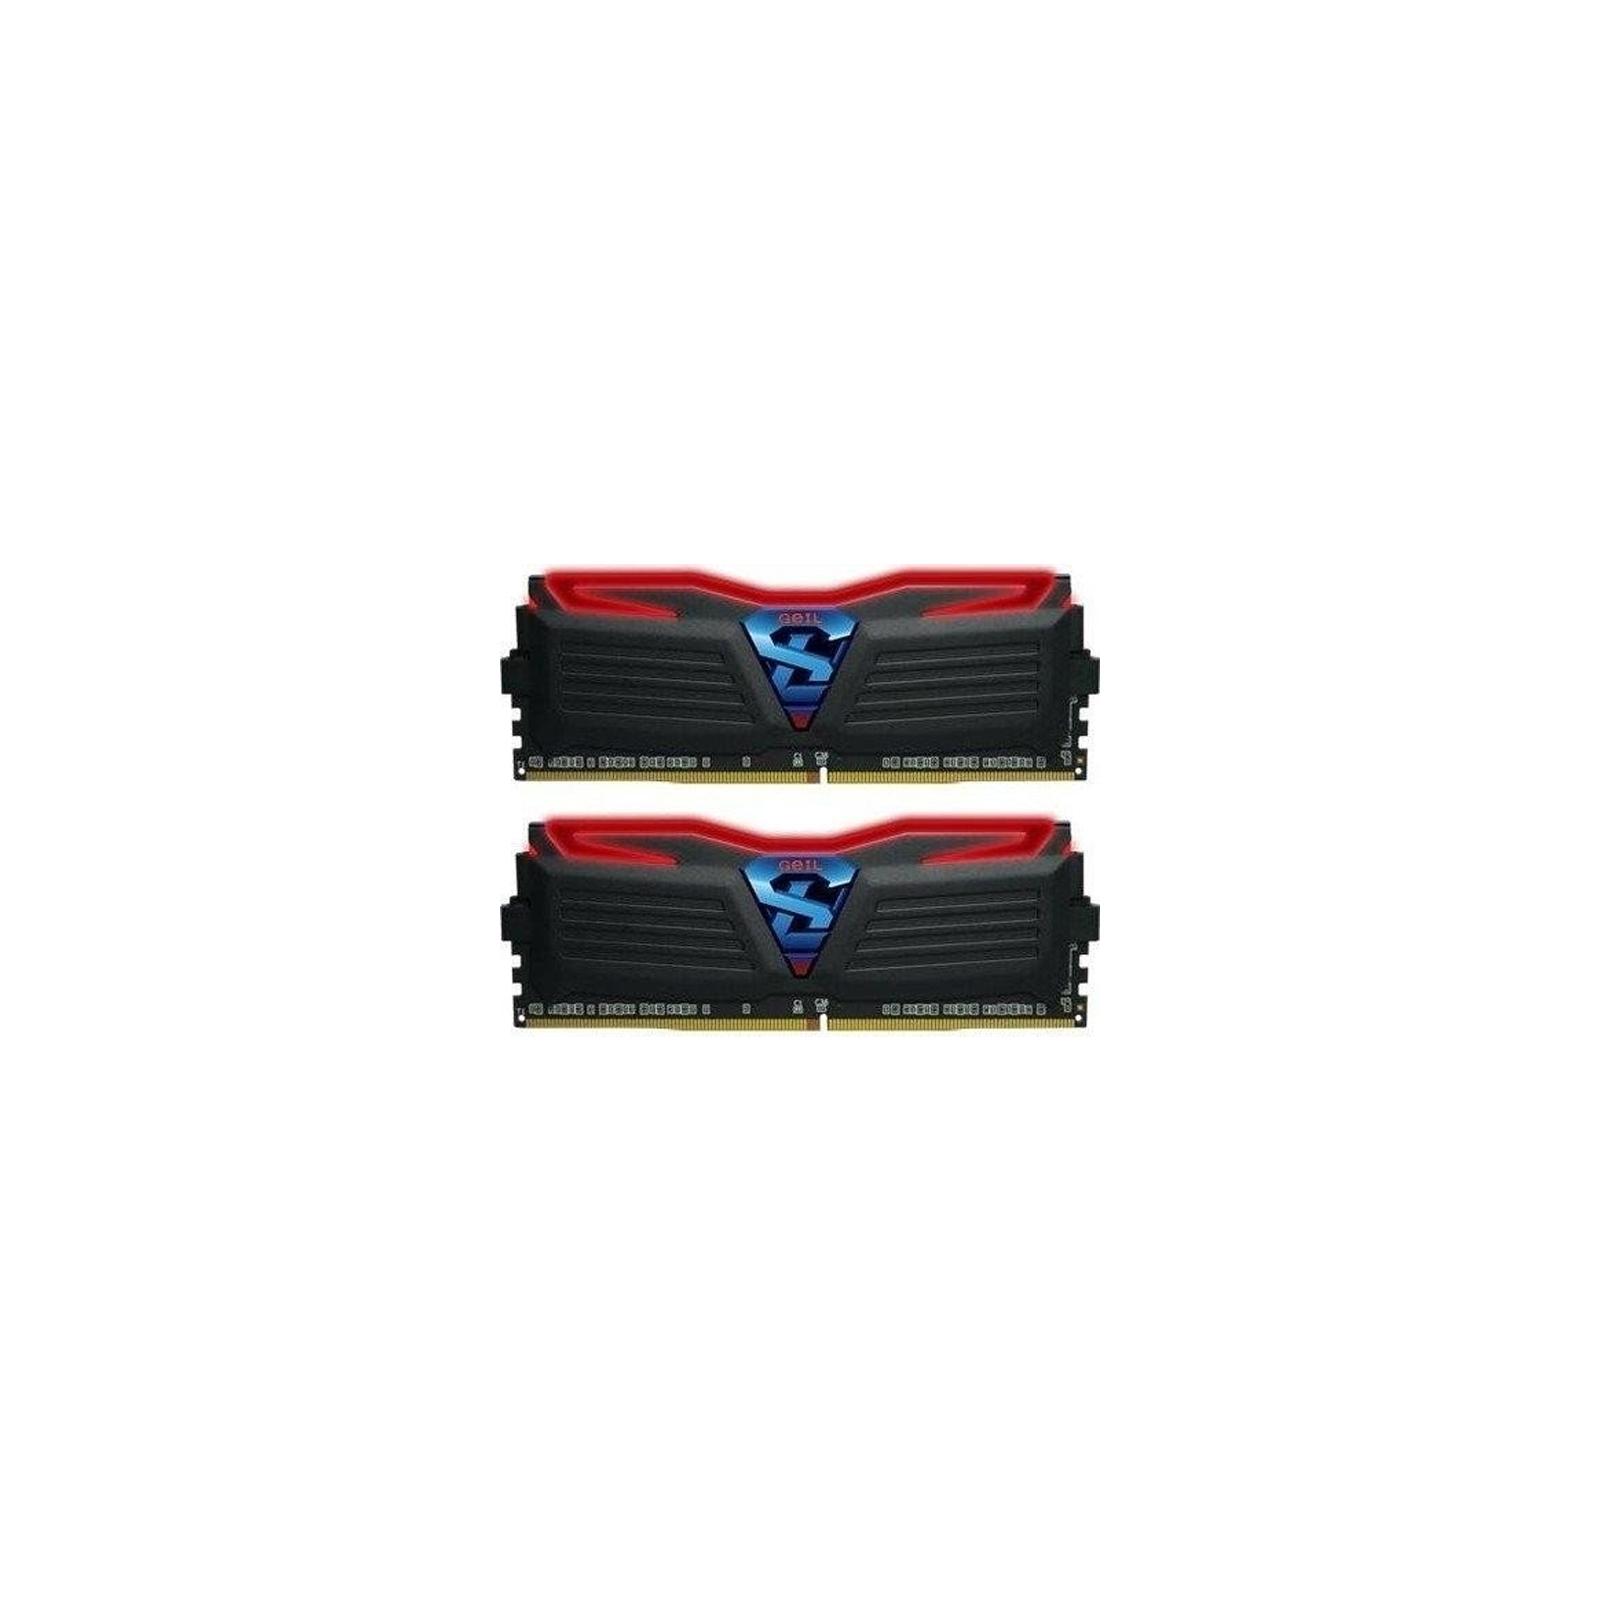 Модуль памяти для компьютера DDR4 32GB (2x16GB) 2400 MHz GEIL (GLR432GB2400C14DC)